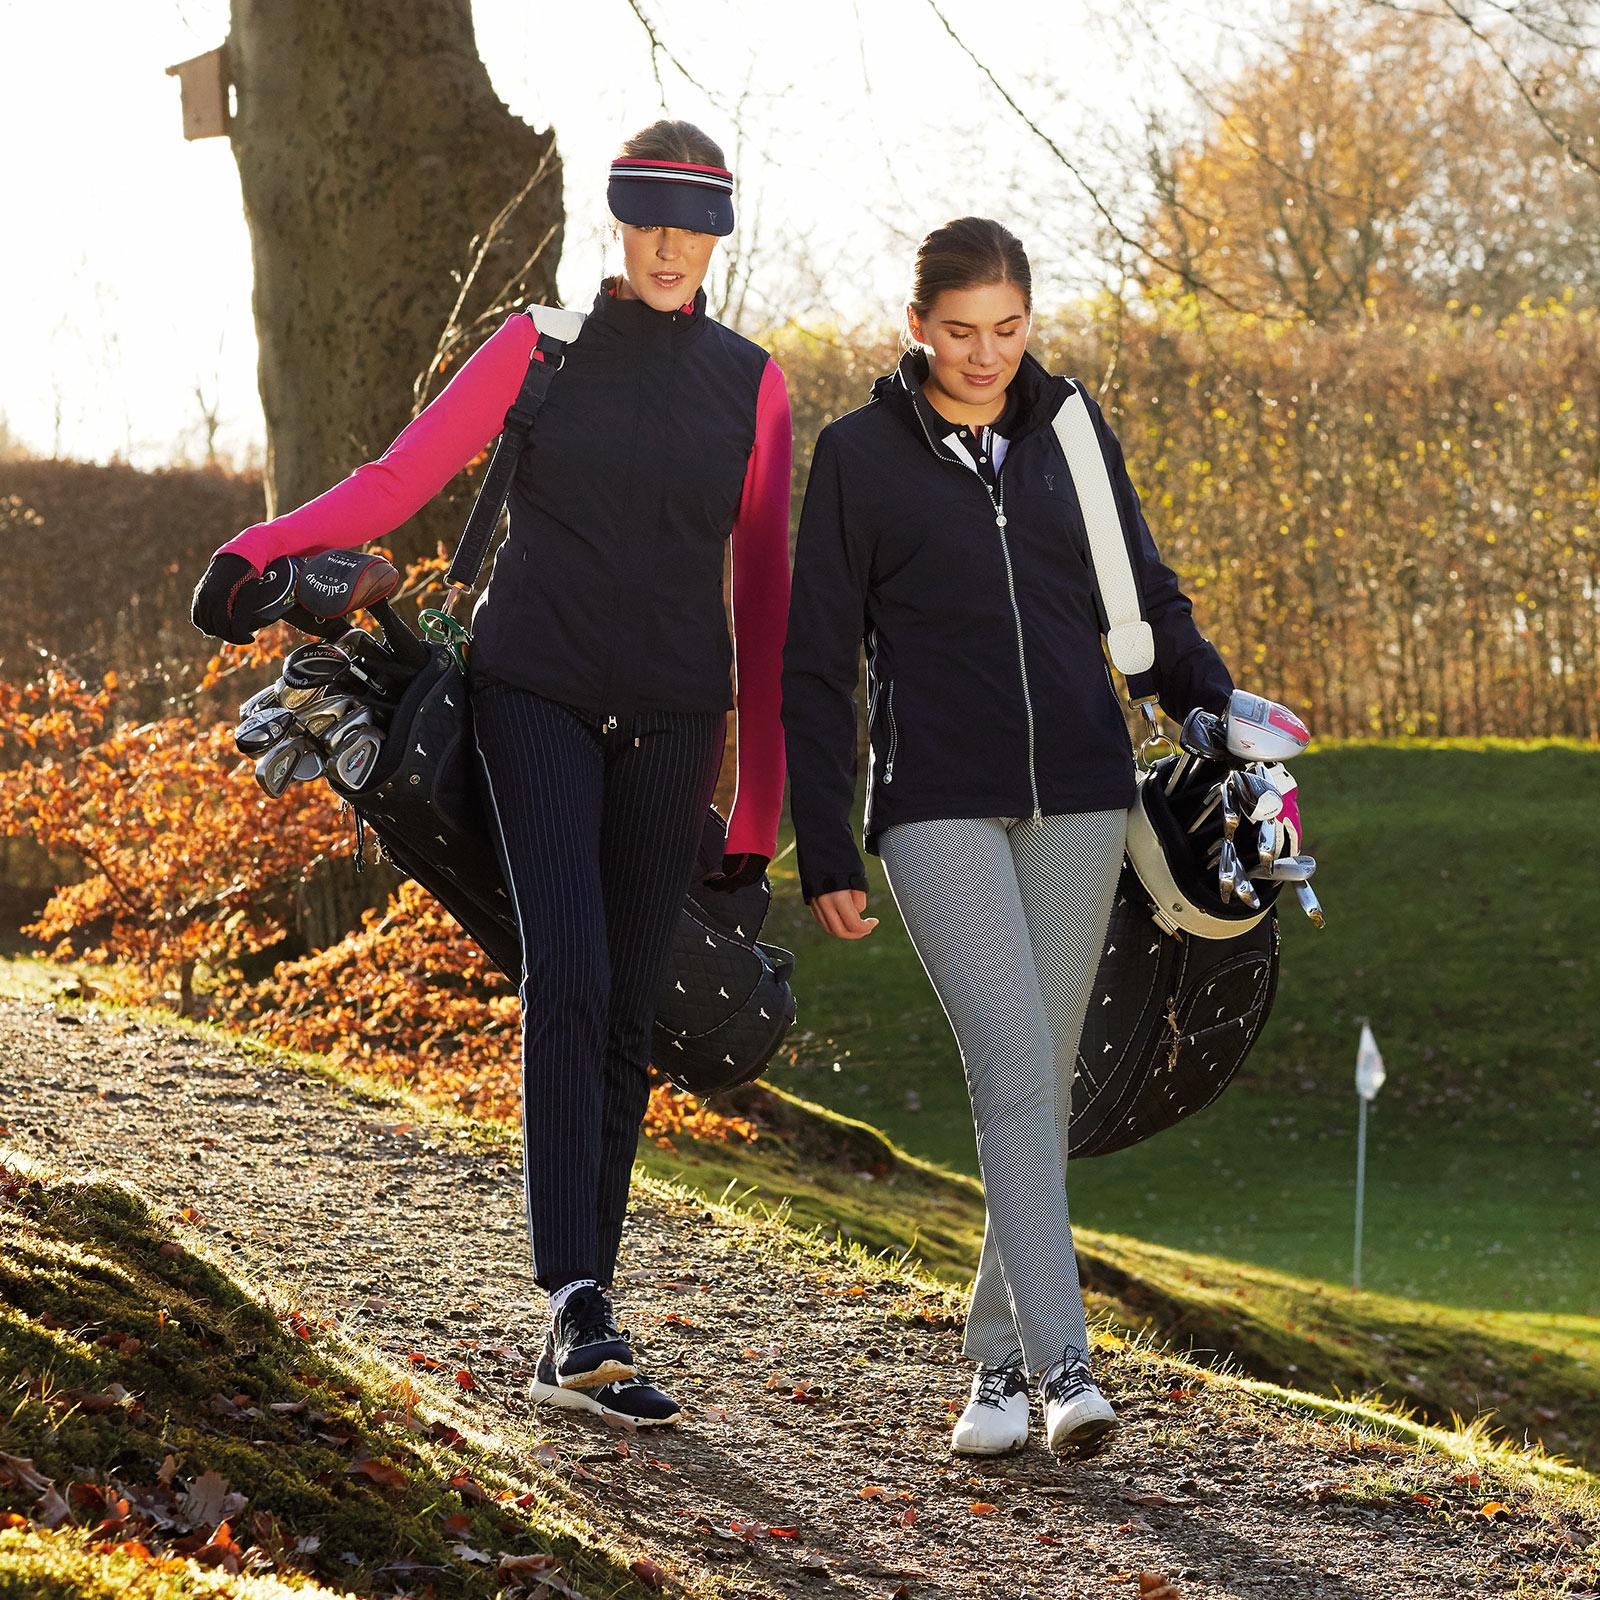 Gemusterte 7/8 Damen Golfhose mit Stretchfunktion im 5-Pocket-Stil